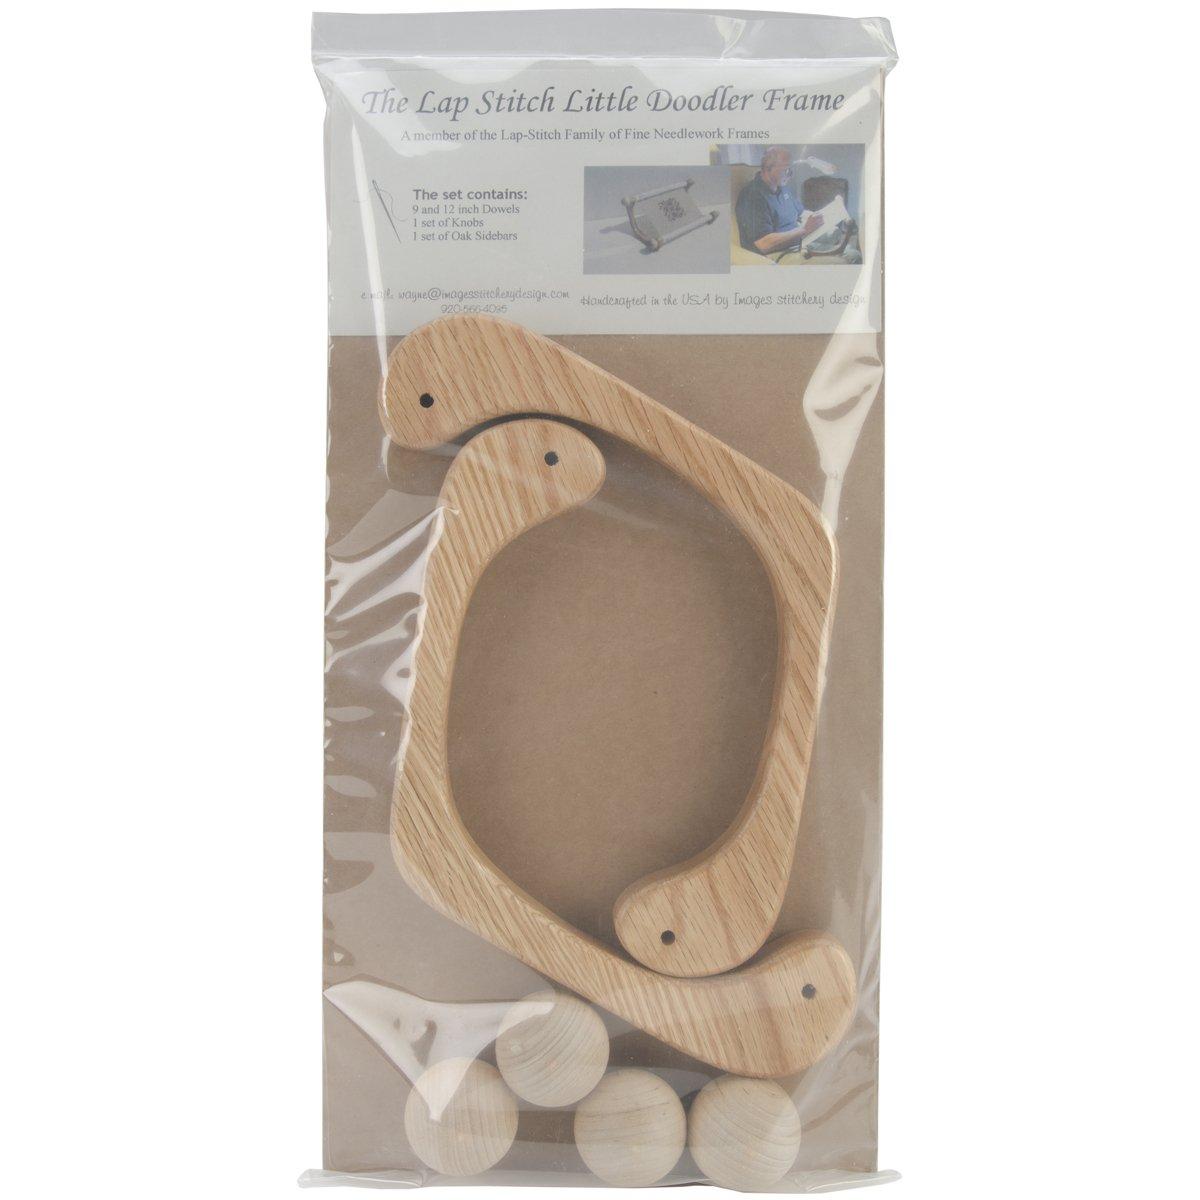 Images Stitchery Design 0042 Lap Stitch Little Doodler Frame with 2 Dowels